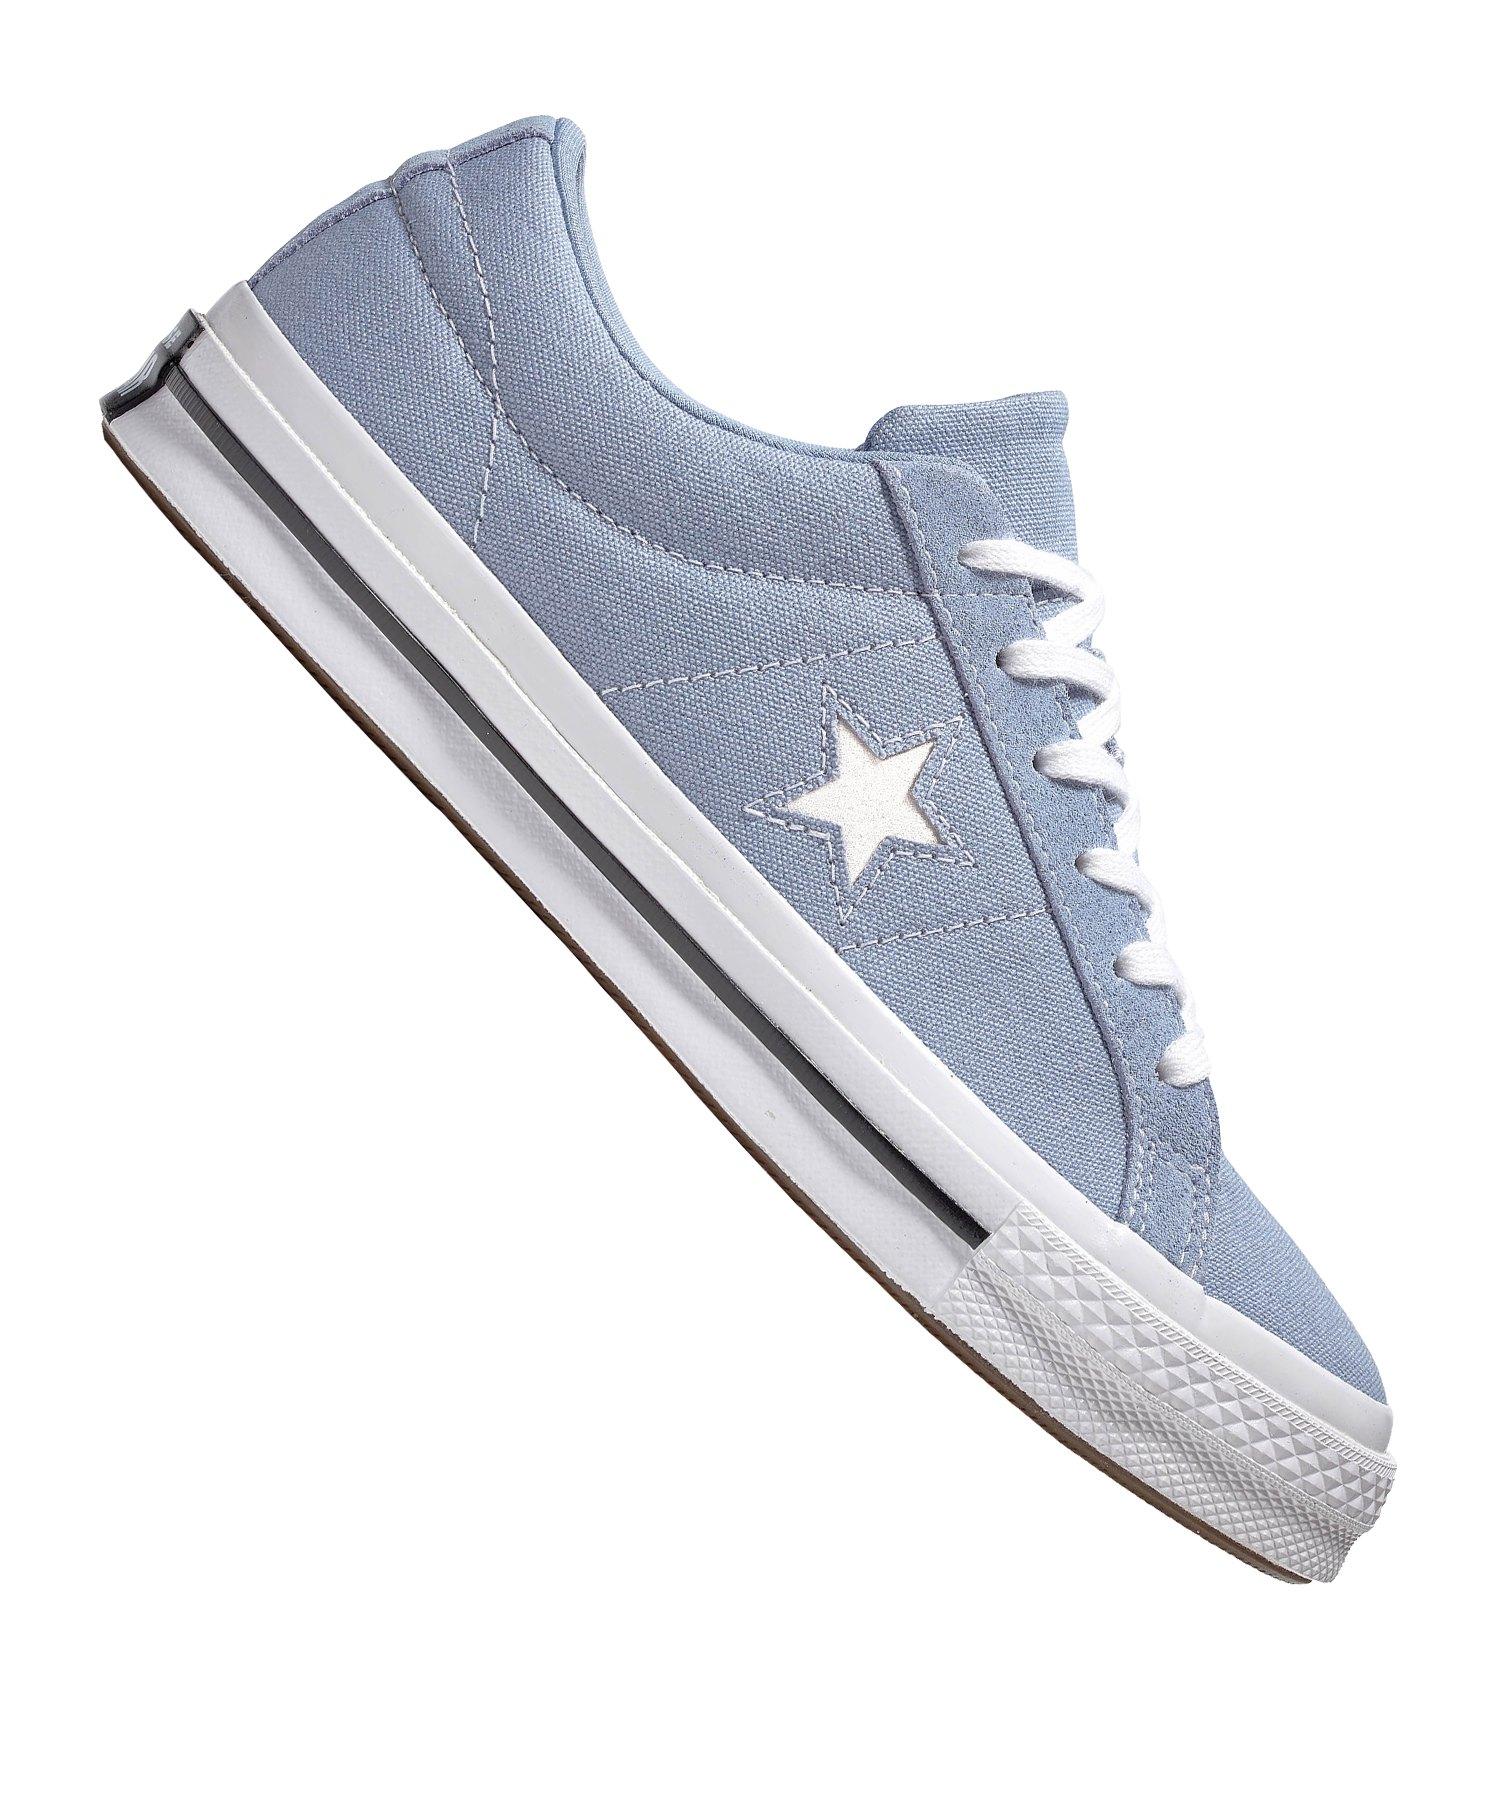 Schuhe Herren Converse ONE STAR PRO OX SNEAKER Herren